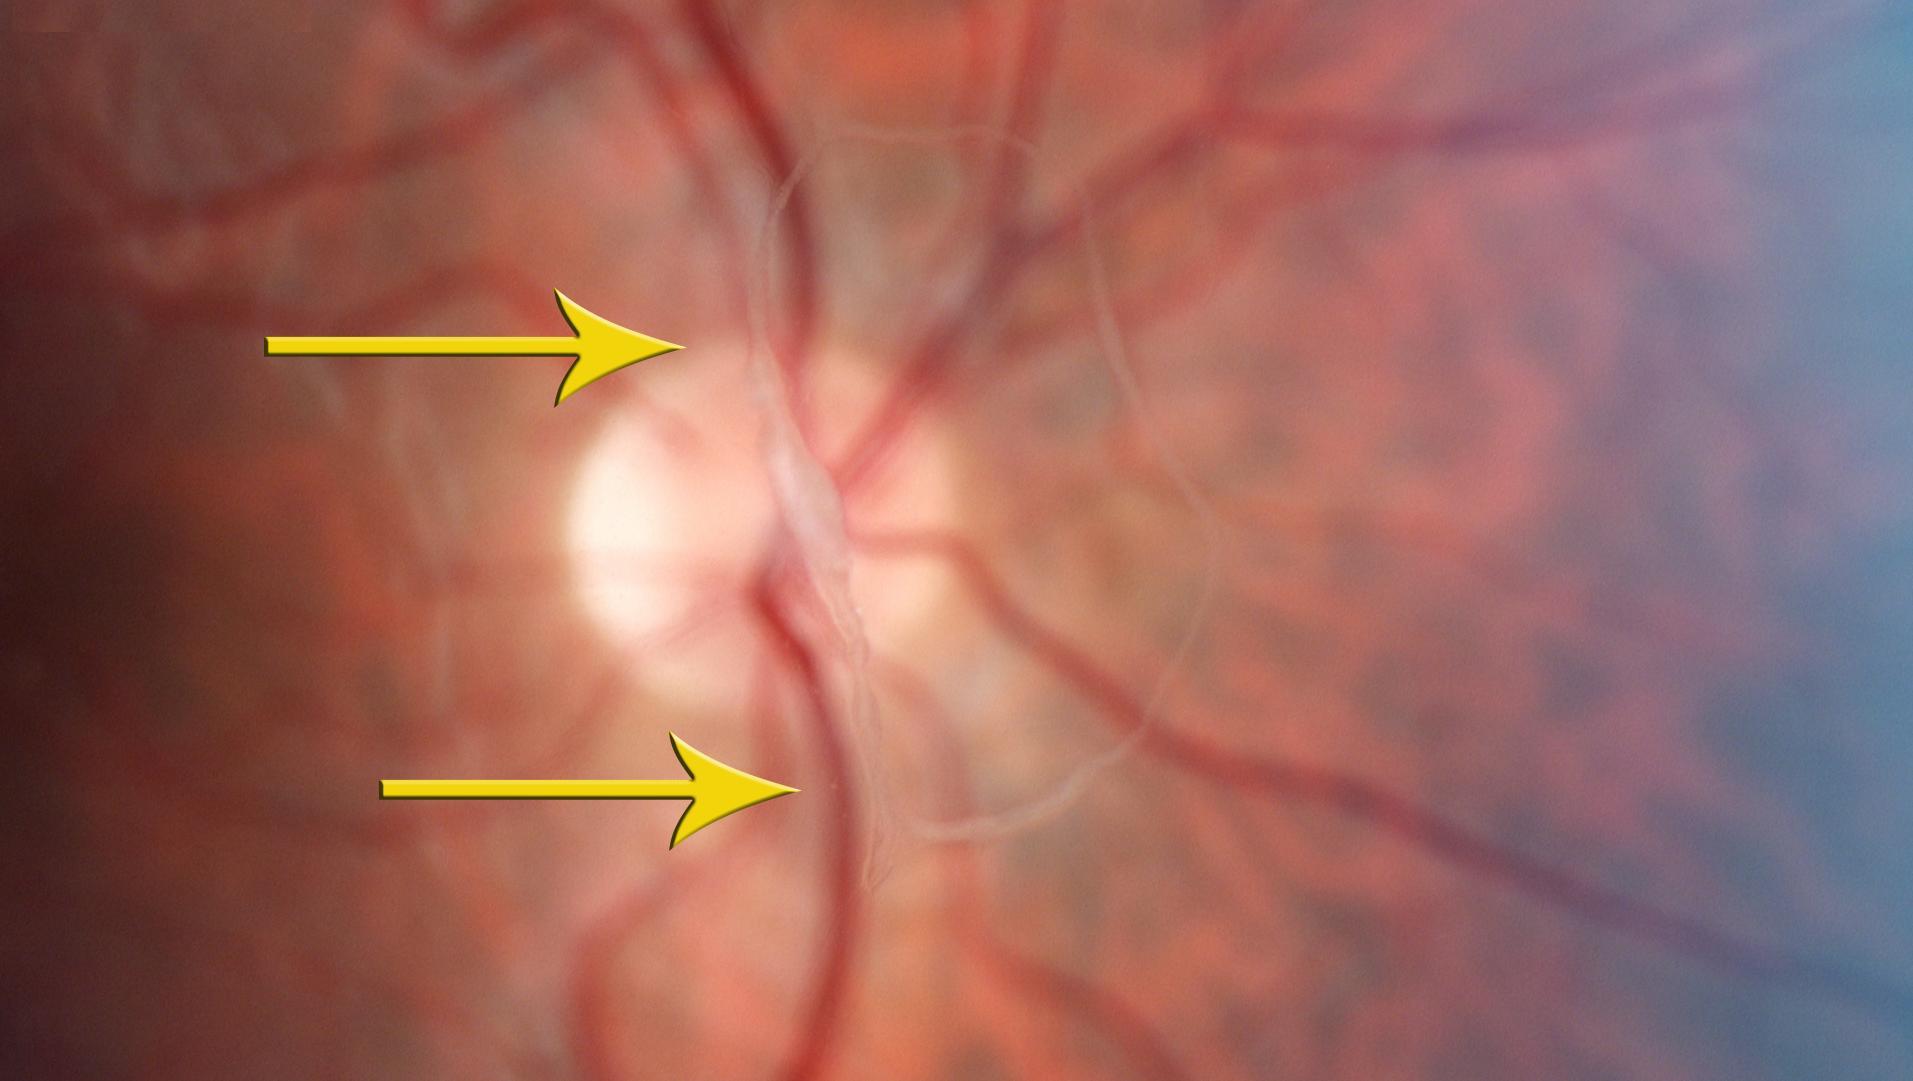 Перед глазами – мерцающие зигзаги